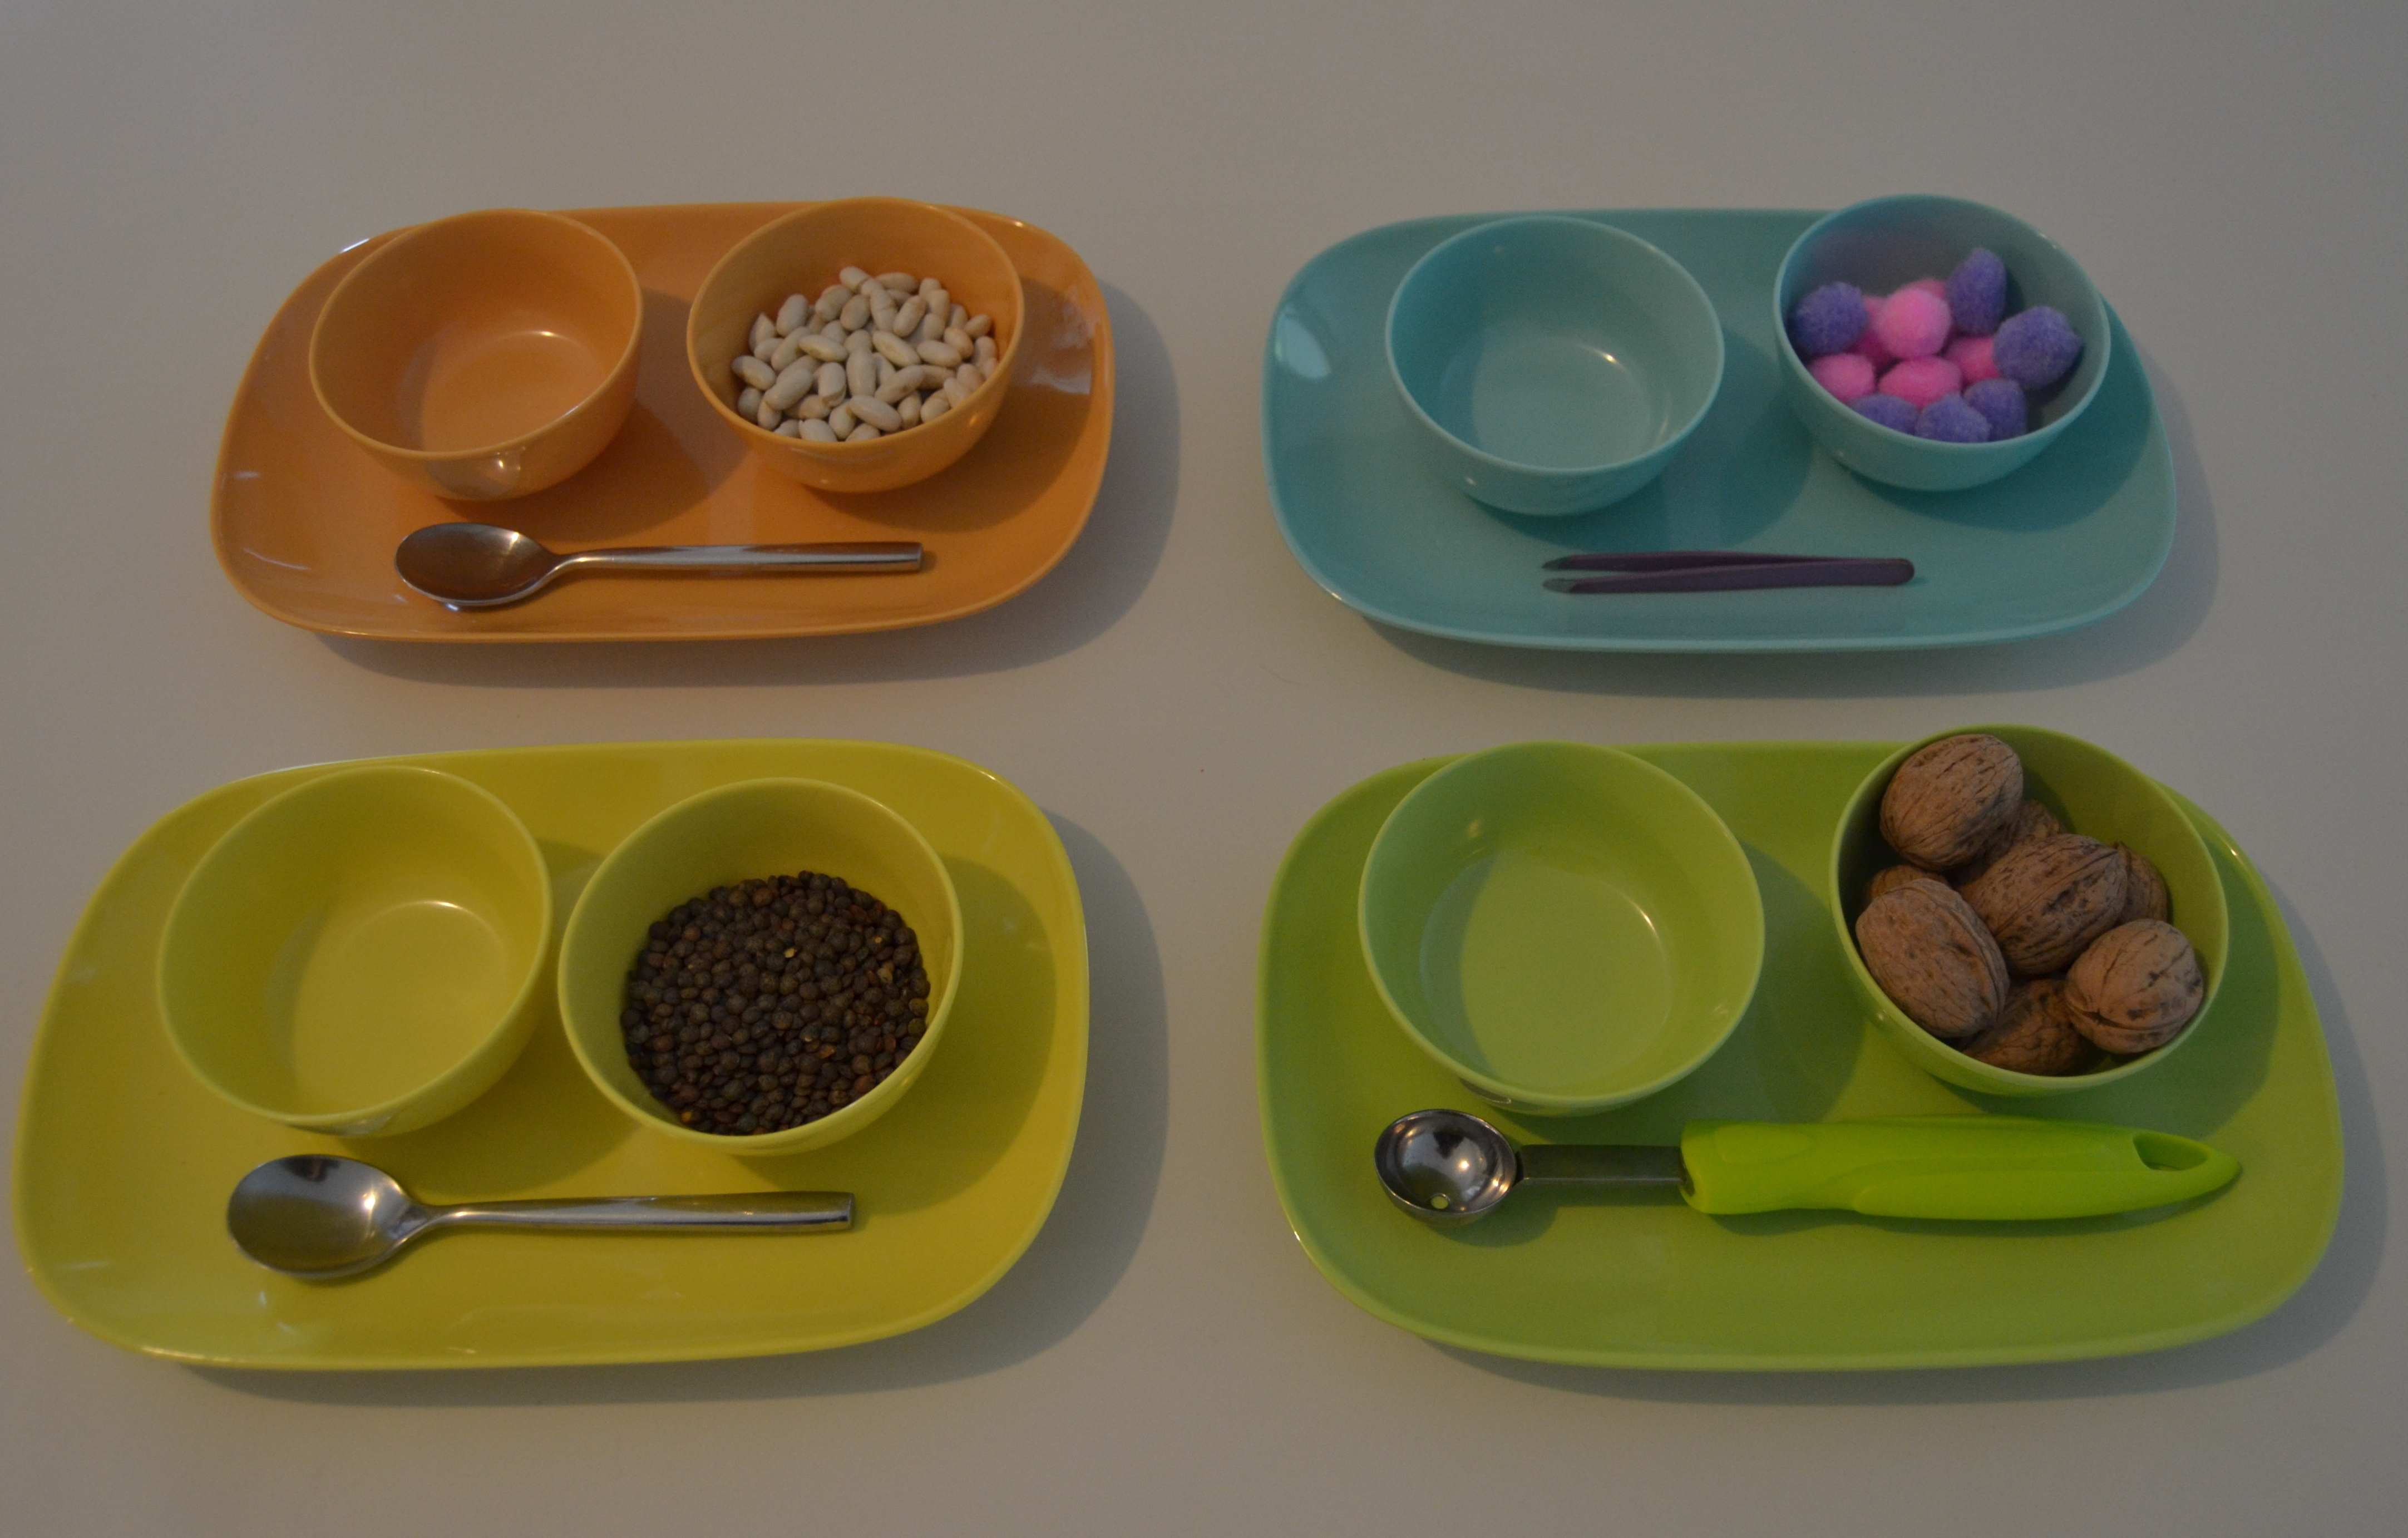 l activit montessori du jour transfert d objets en 4. Black Bedroom Furniture Sets. Home Design Ideas